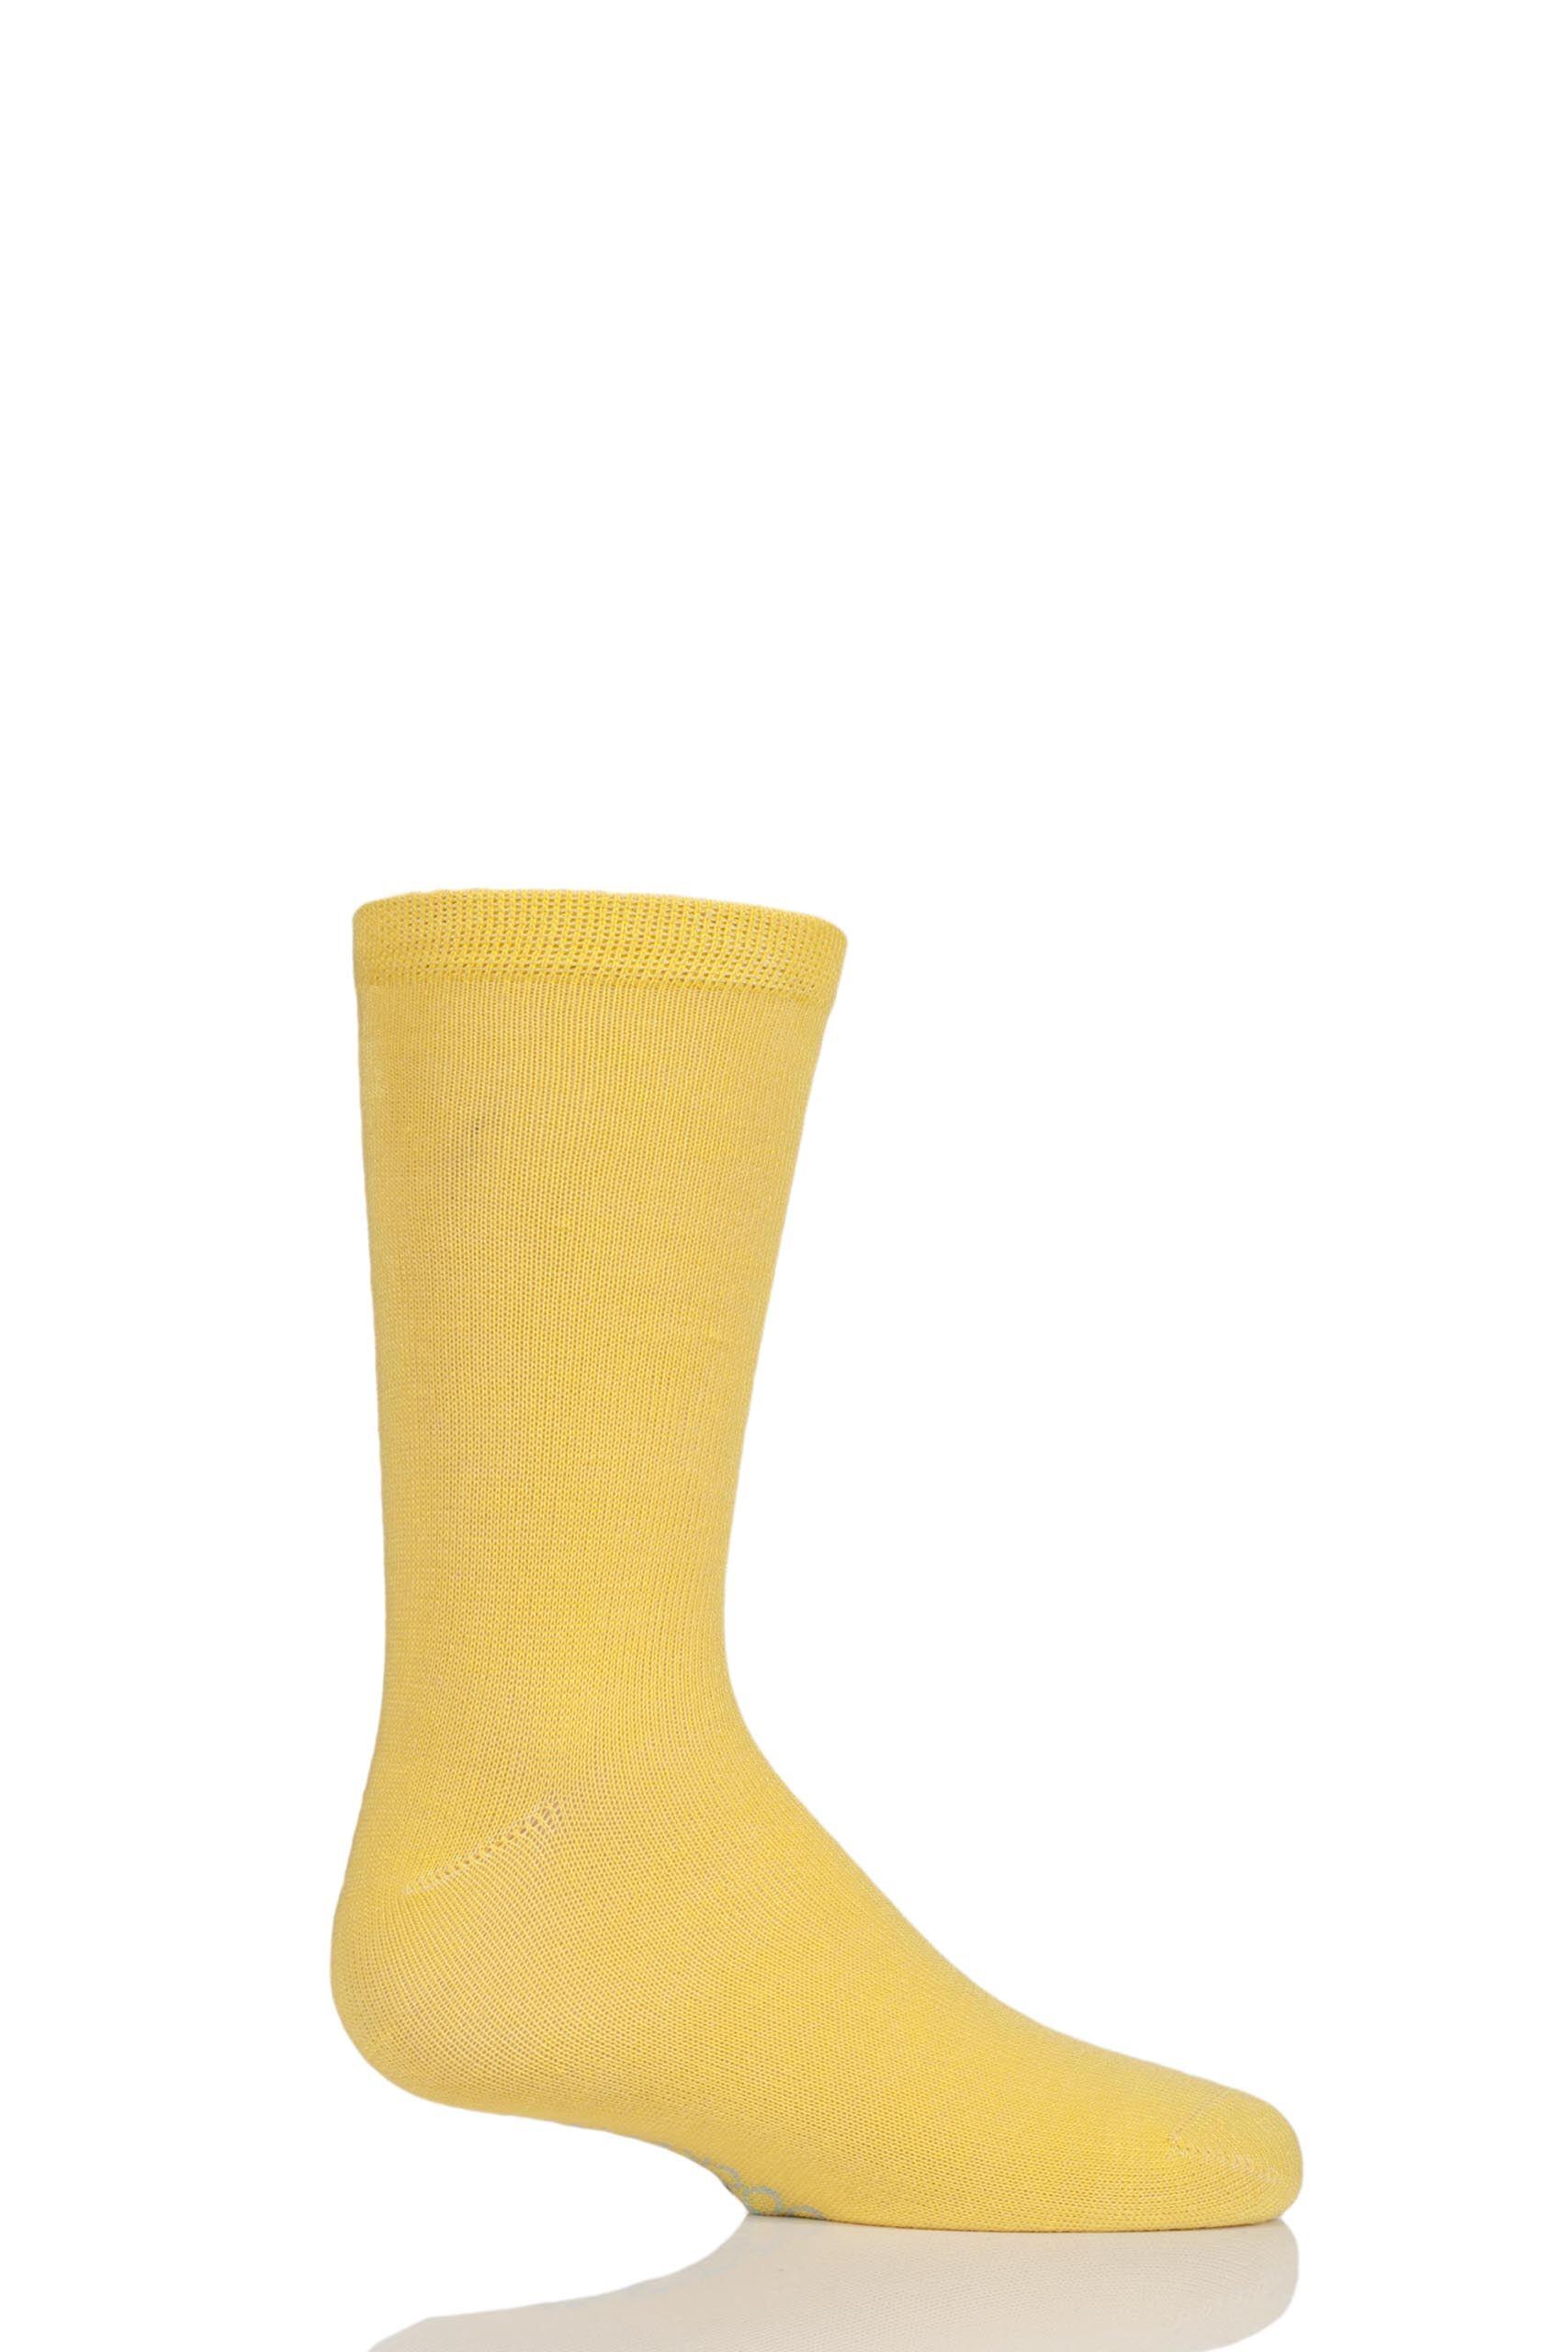 Image of 1 Pair Sunshine Yellow Plain Bamboo Socks with Comfort Cuff and Smooth Toe Seams Kids Unisex 6-8.5 Kids (1-3 Years) - SOCKSHOP